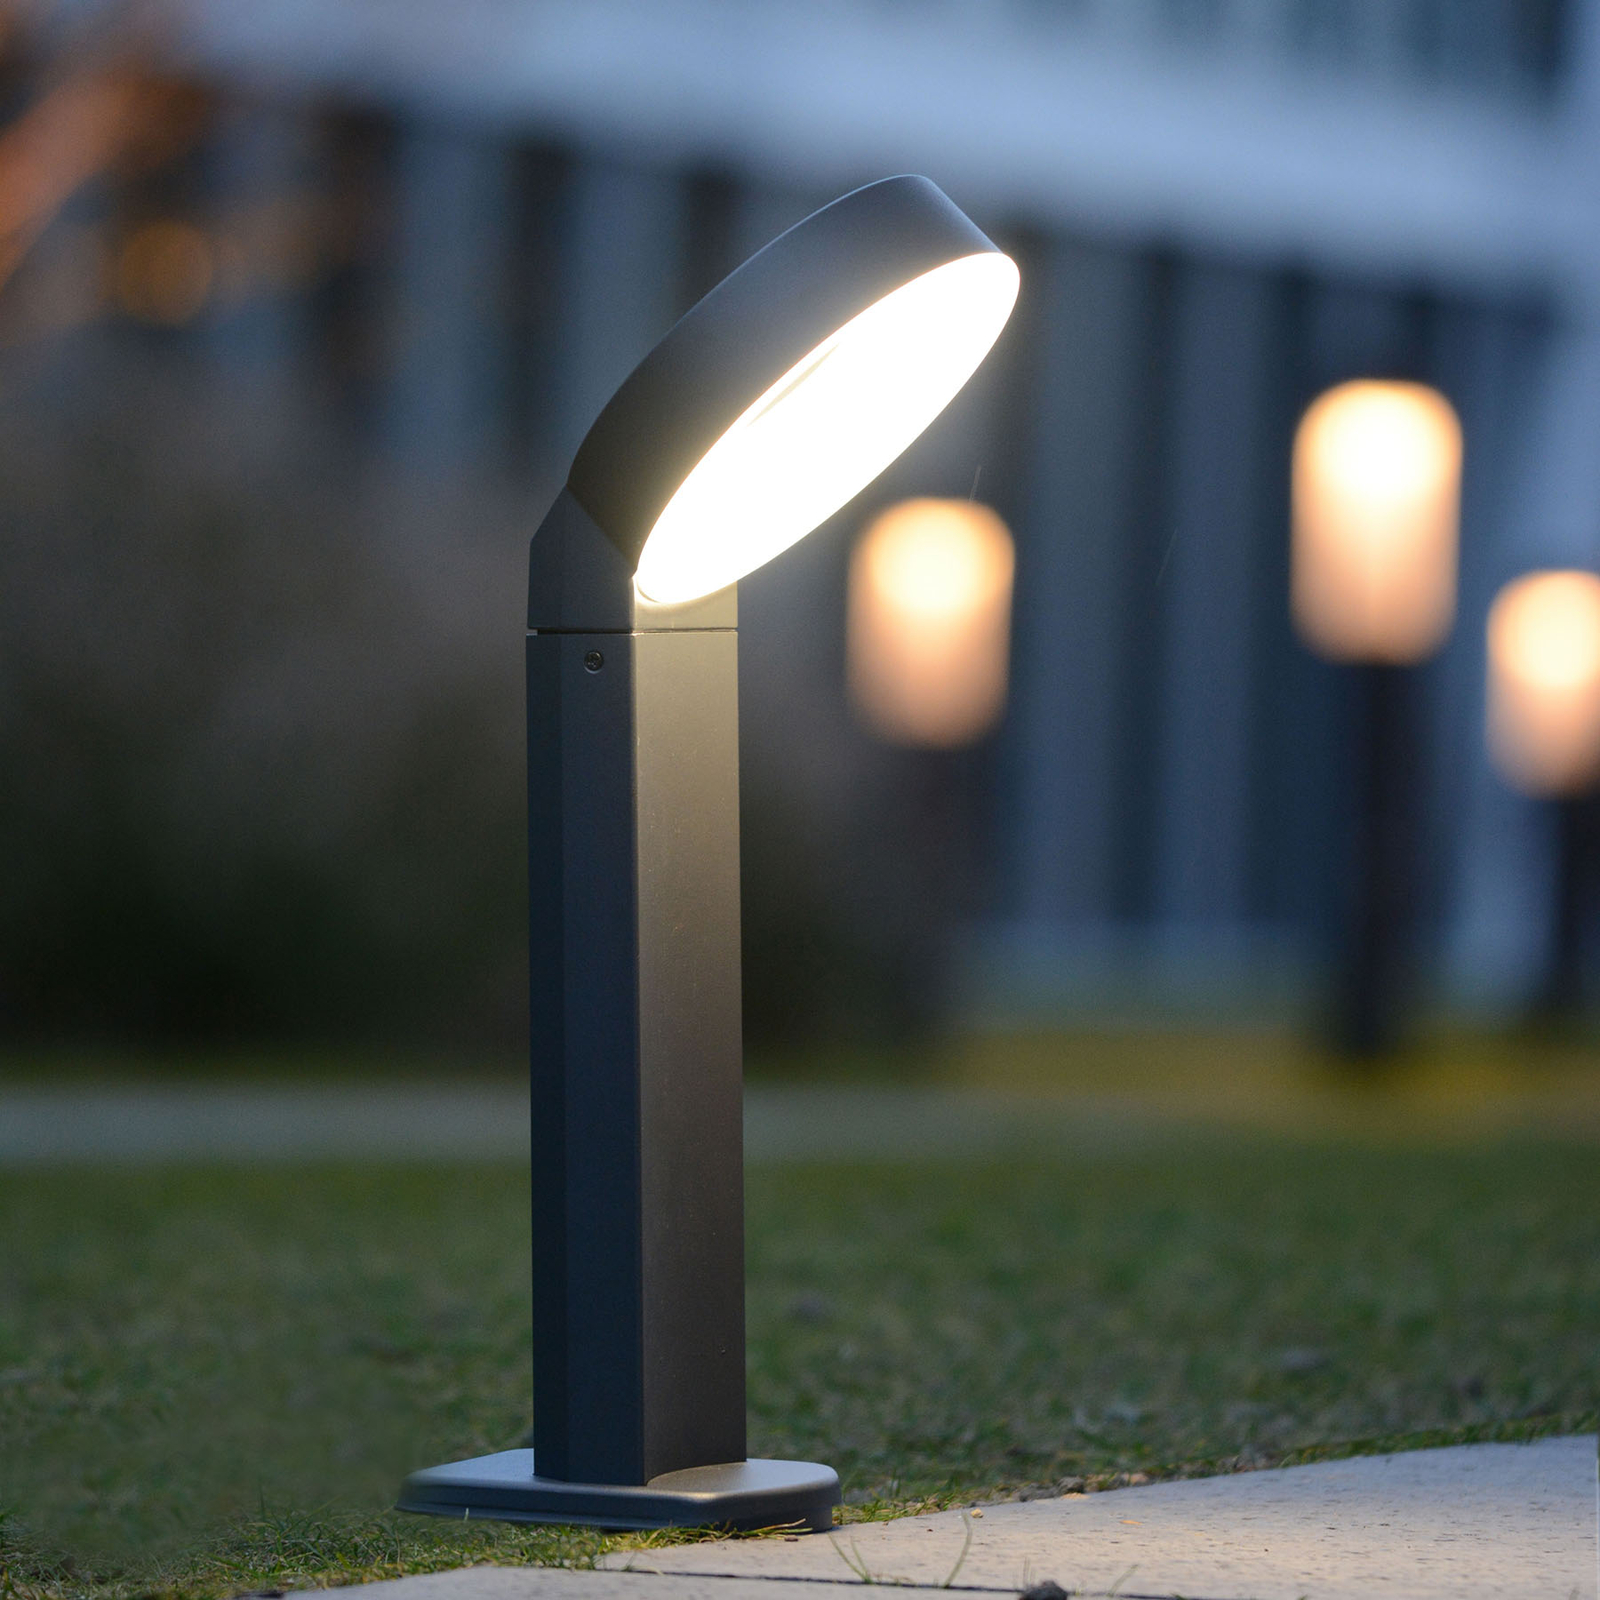 LED-Sockelleuchte Meridian mit ringförmigem Kopf